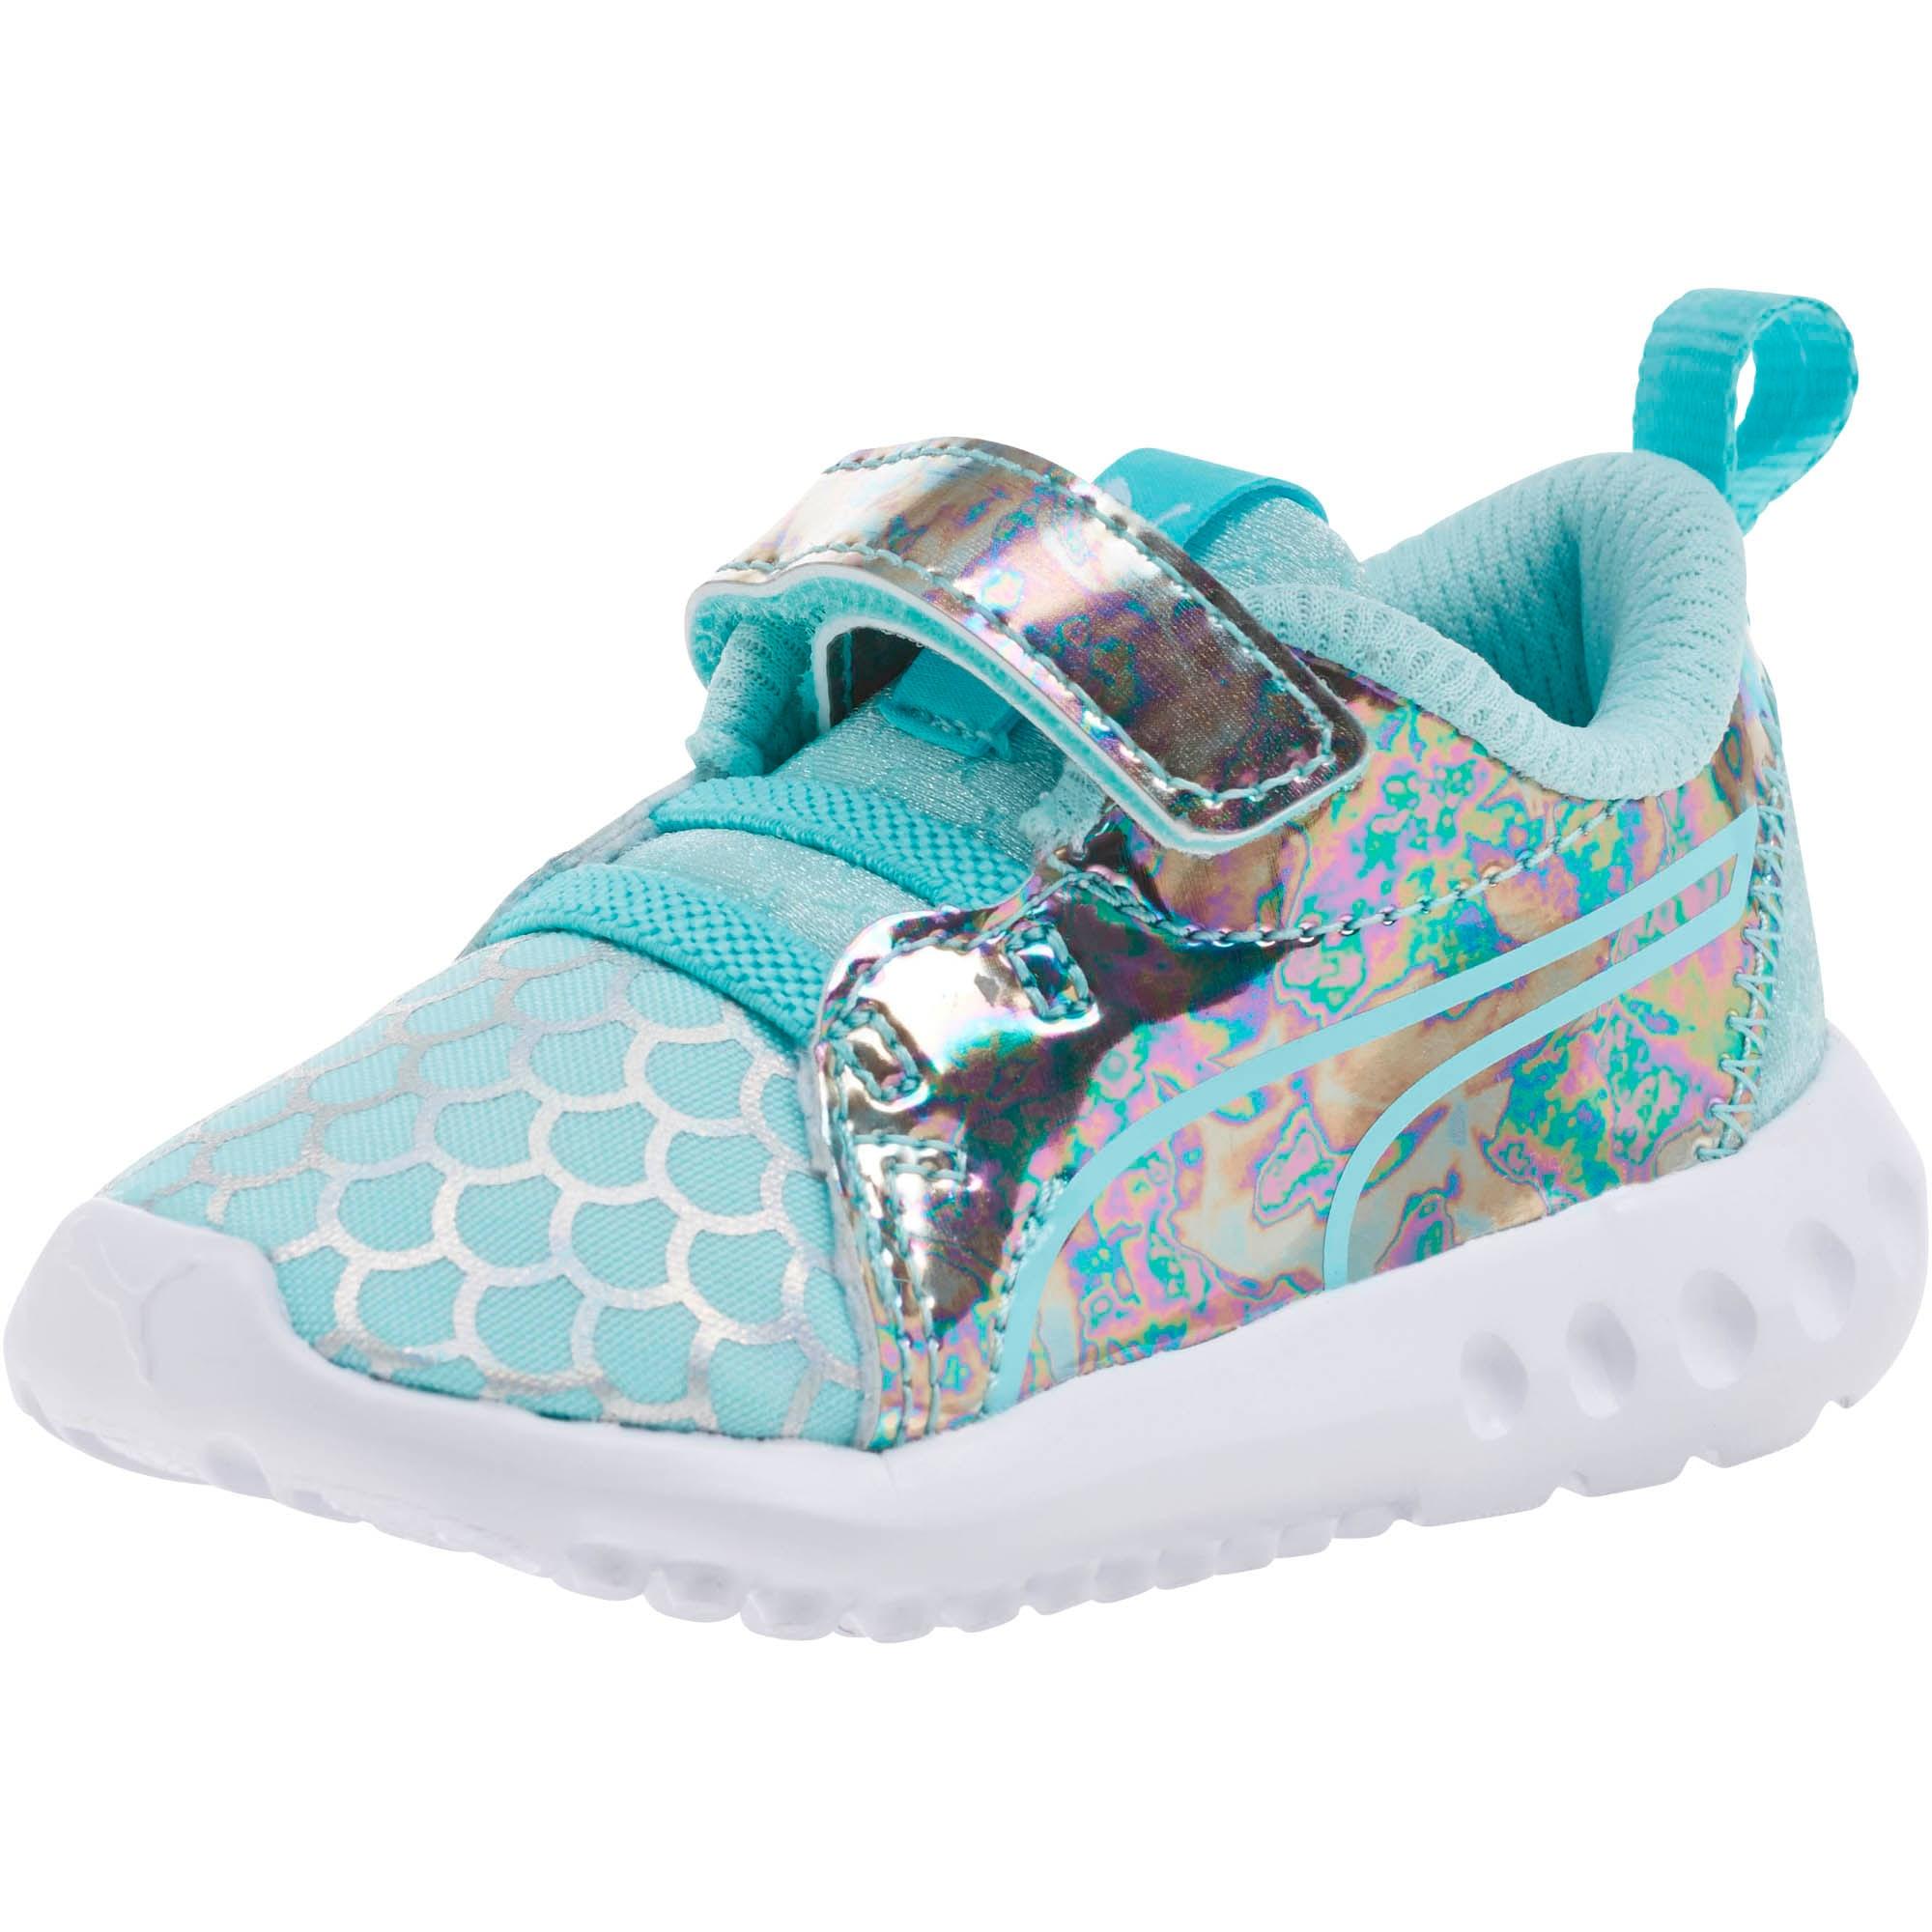 Carson 2 Mermaid AC Toddler Shoes